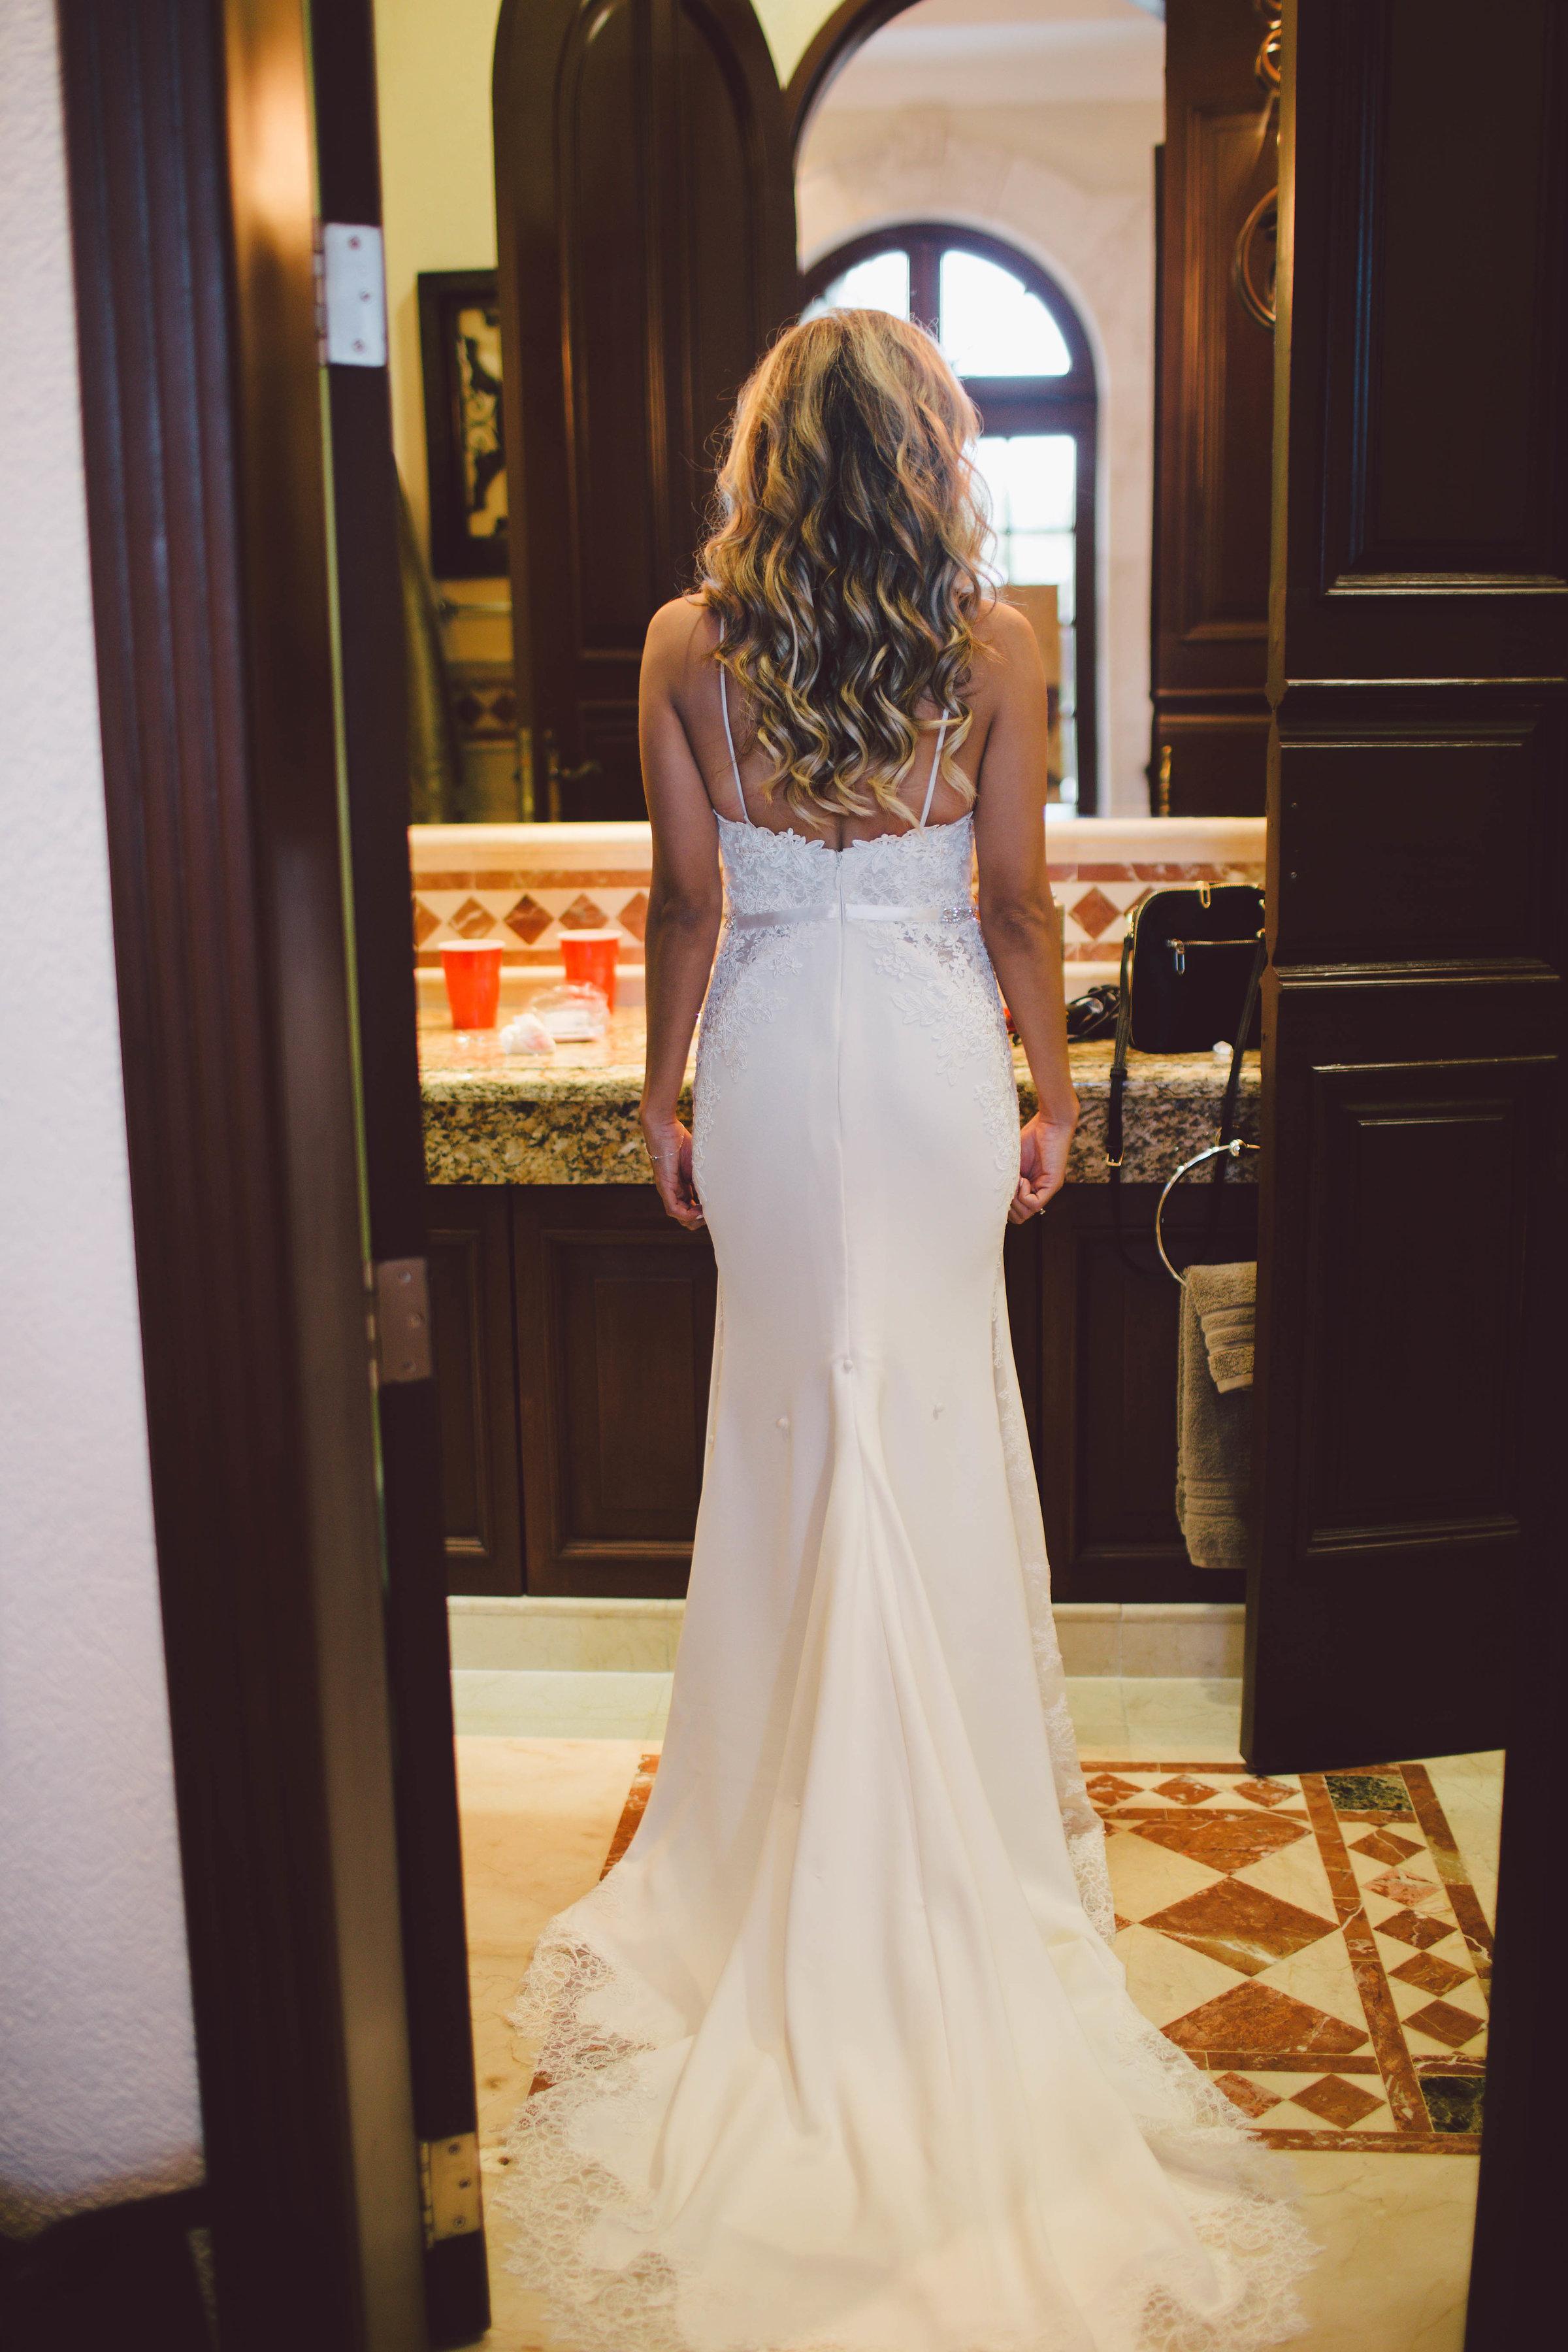 mexico_wedding_cancun_villa_la_joya_evangeline_lane_029.jpg